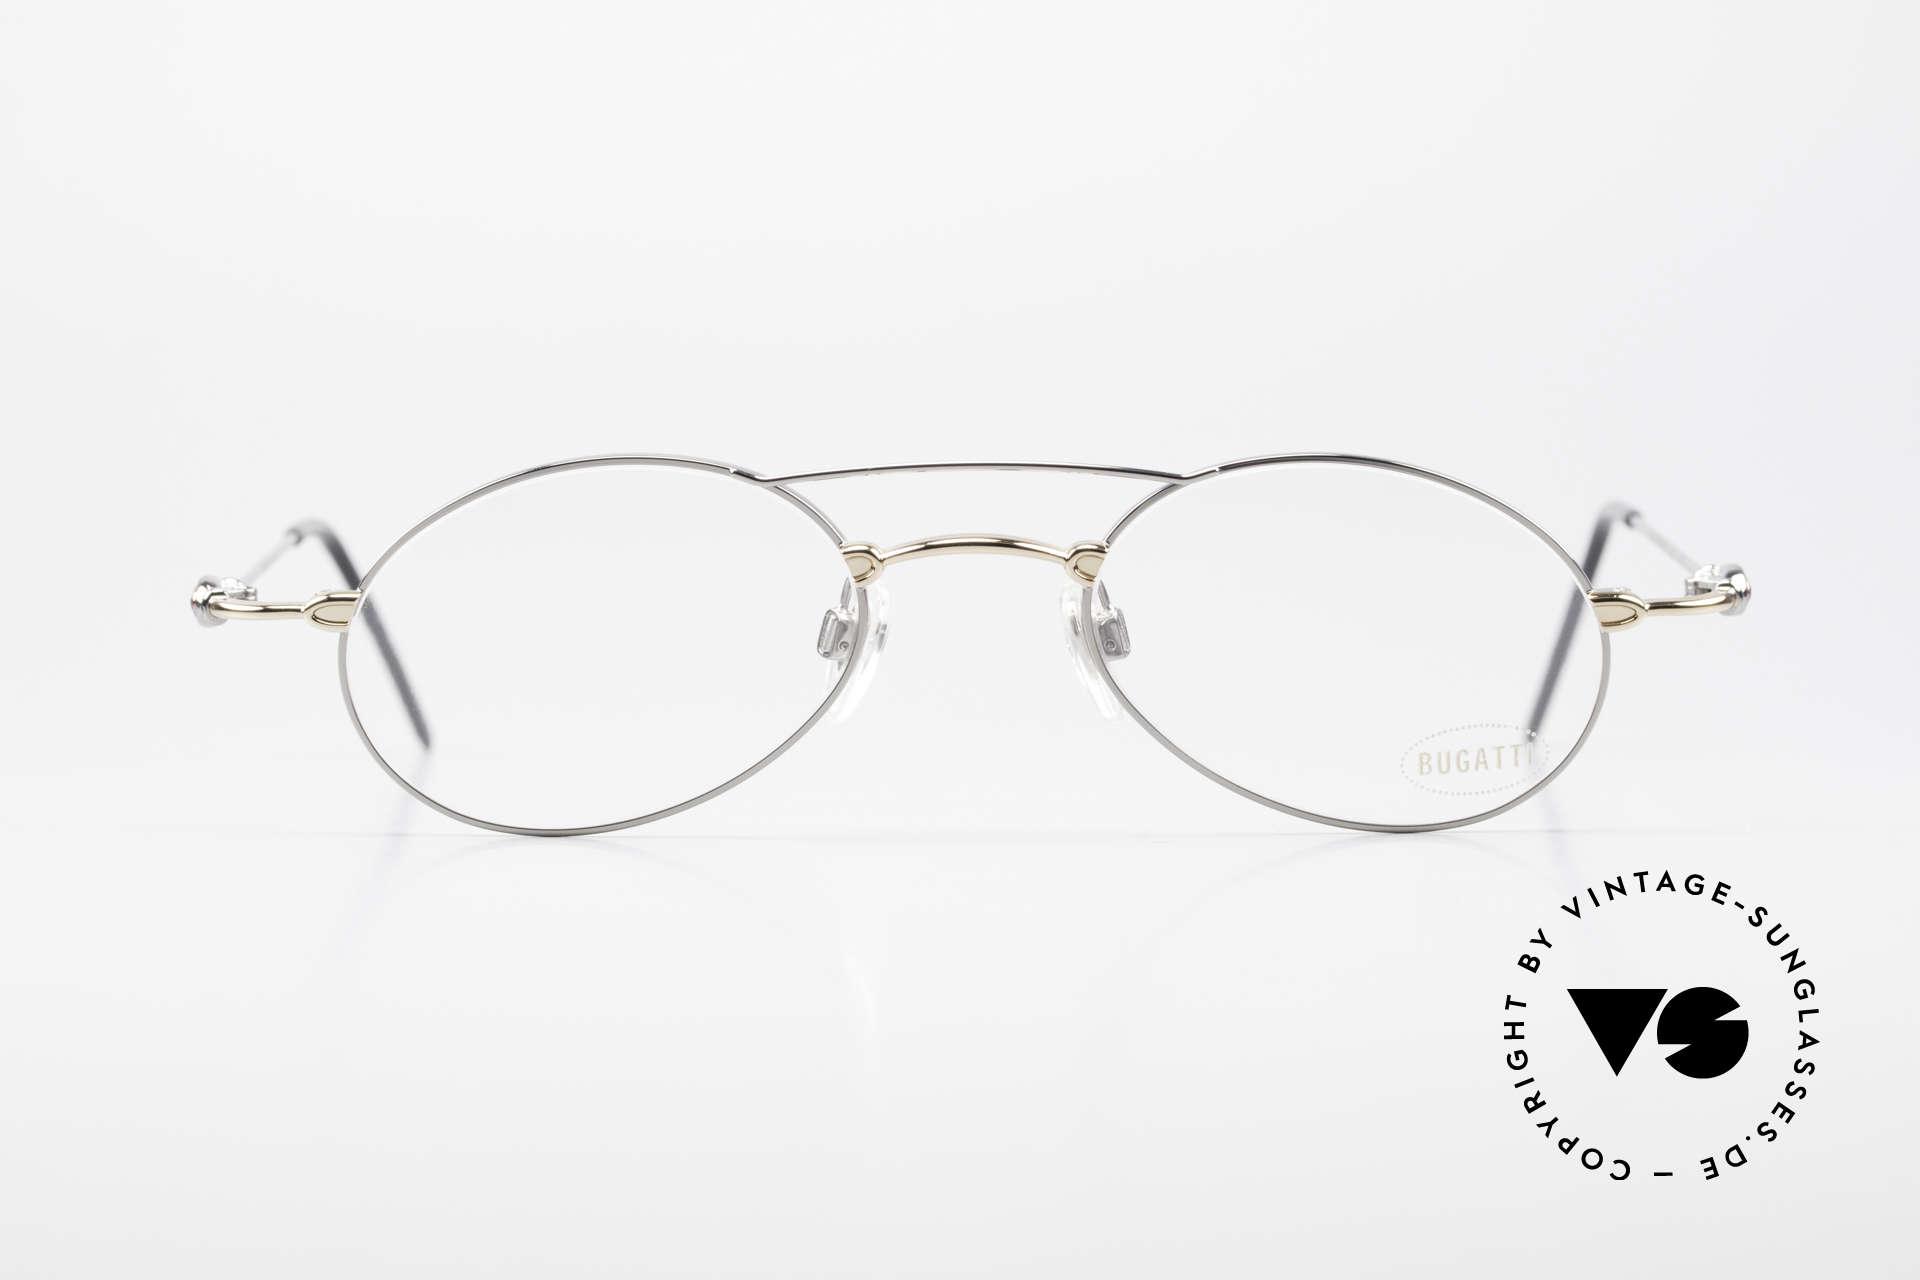 Bugatti 10892 Vintage Men's Eyeglasses 90's, materials and craftsmanship on top level; size 50°21, Made for Men